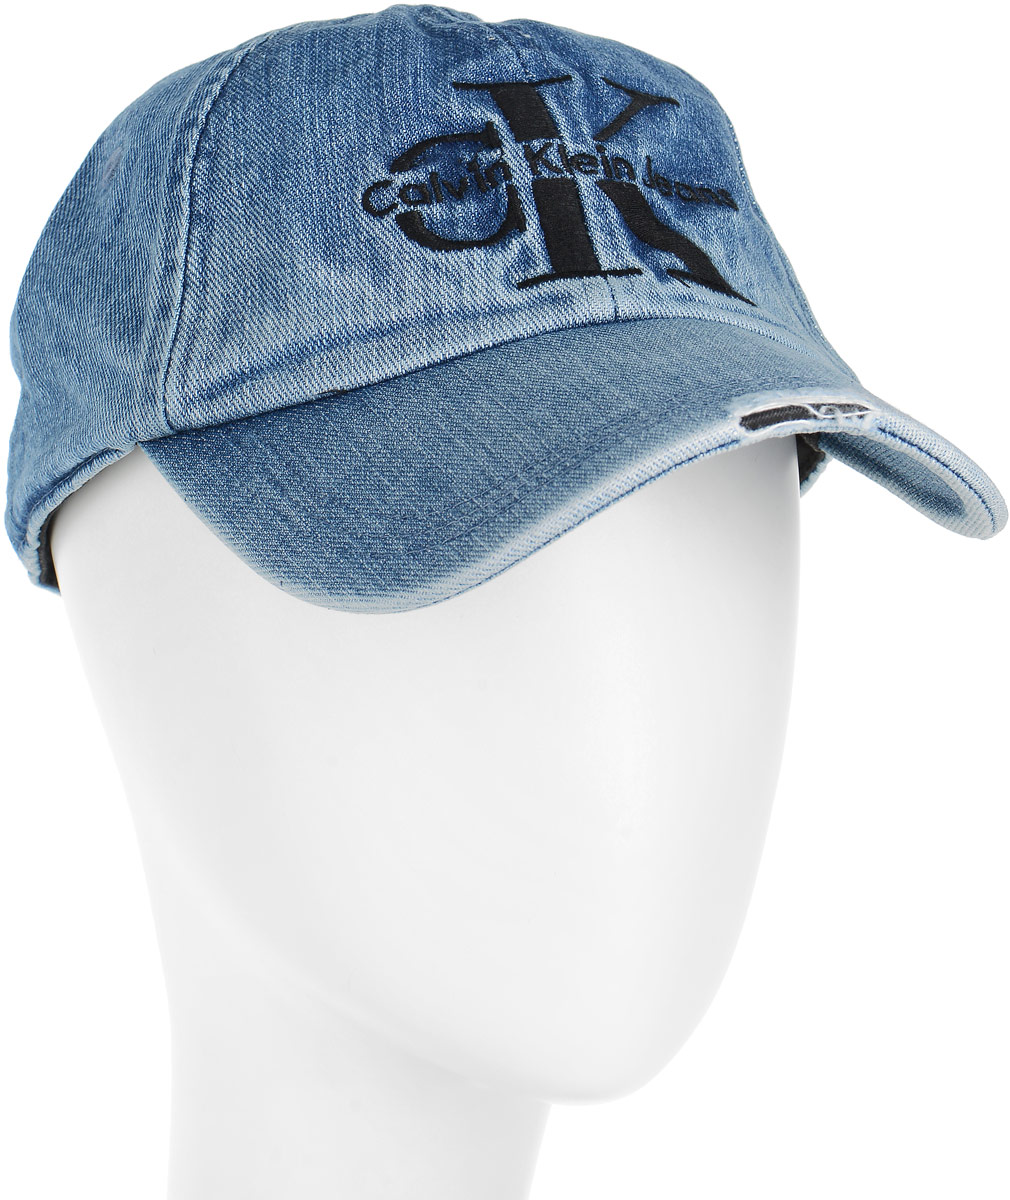 Шапка мужская Calvin Klein Jeans, цвет: синий. K40K400073/433. Размер универсальныйK40K400073/433